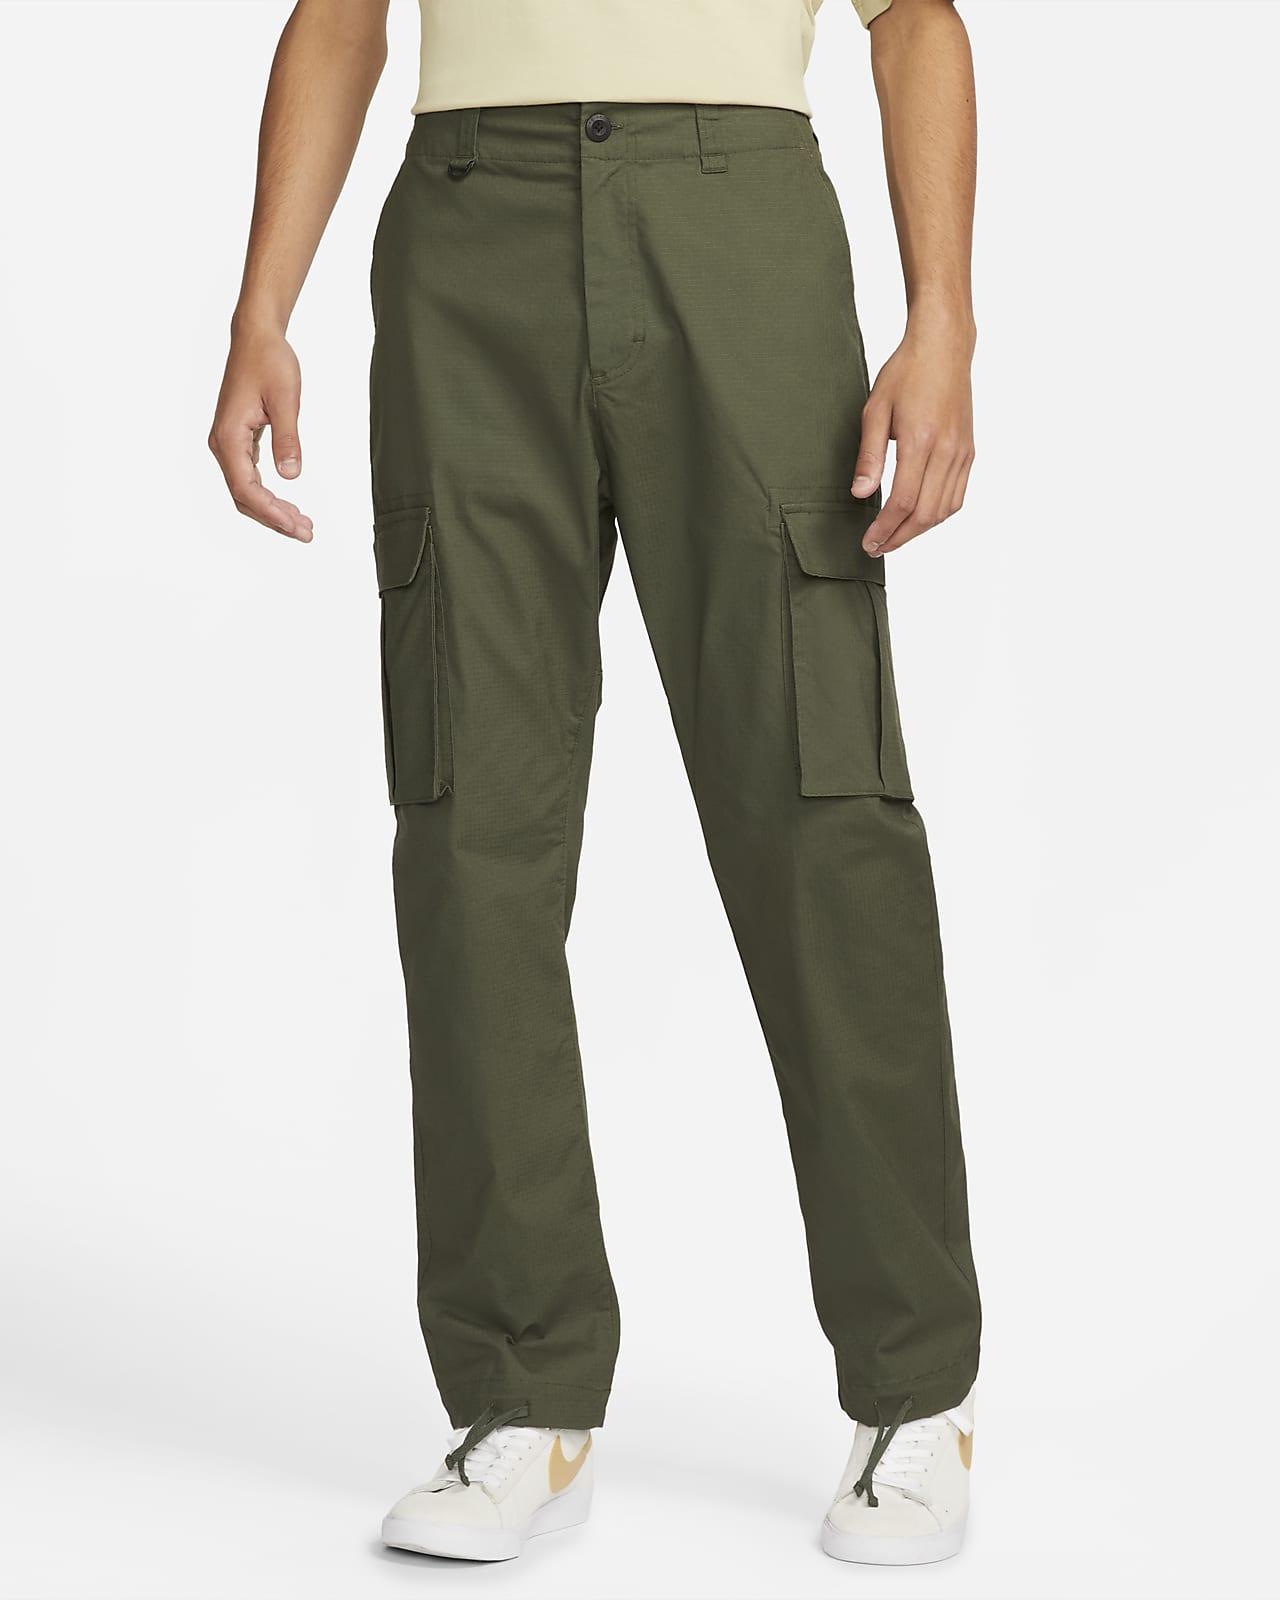 Nike SB Skate Cargo Trousers